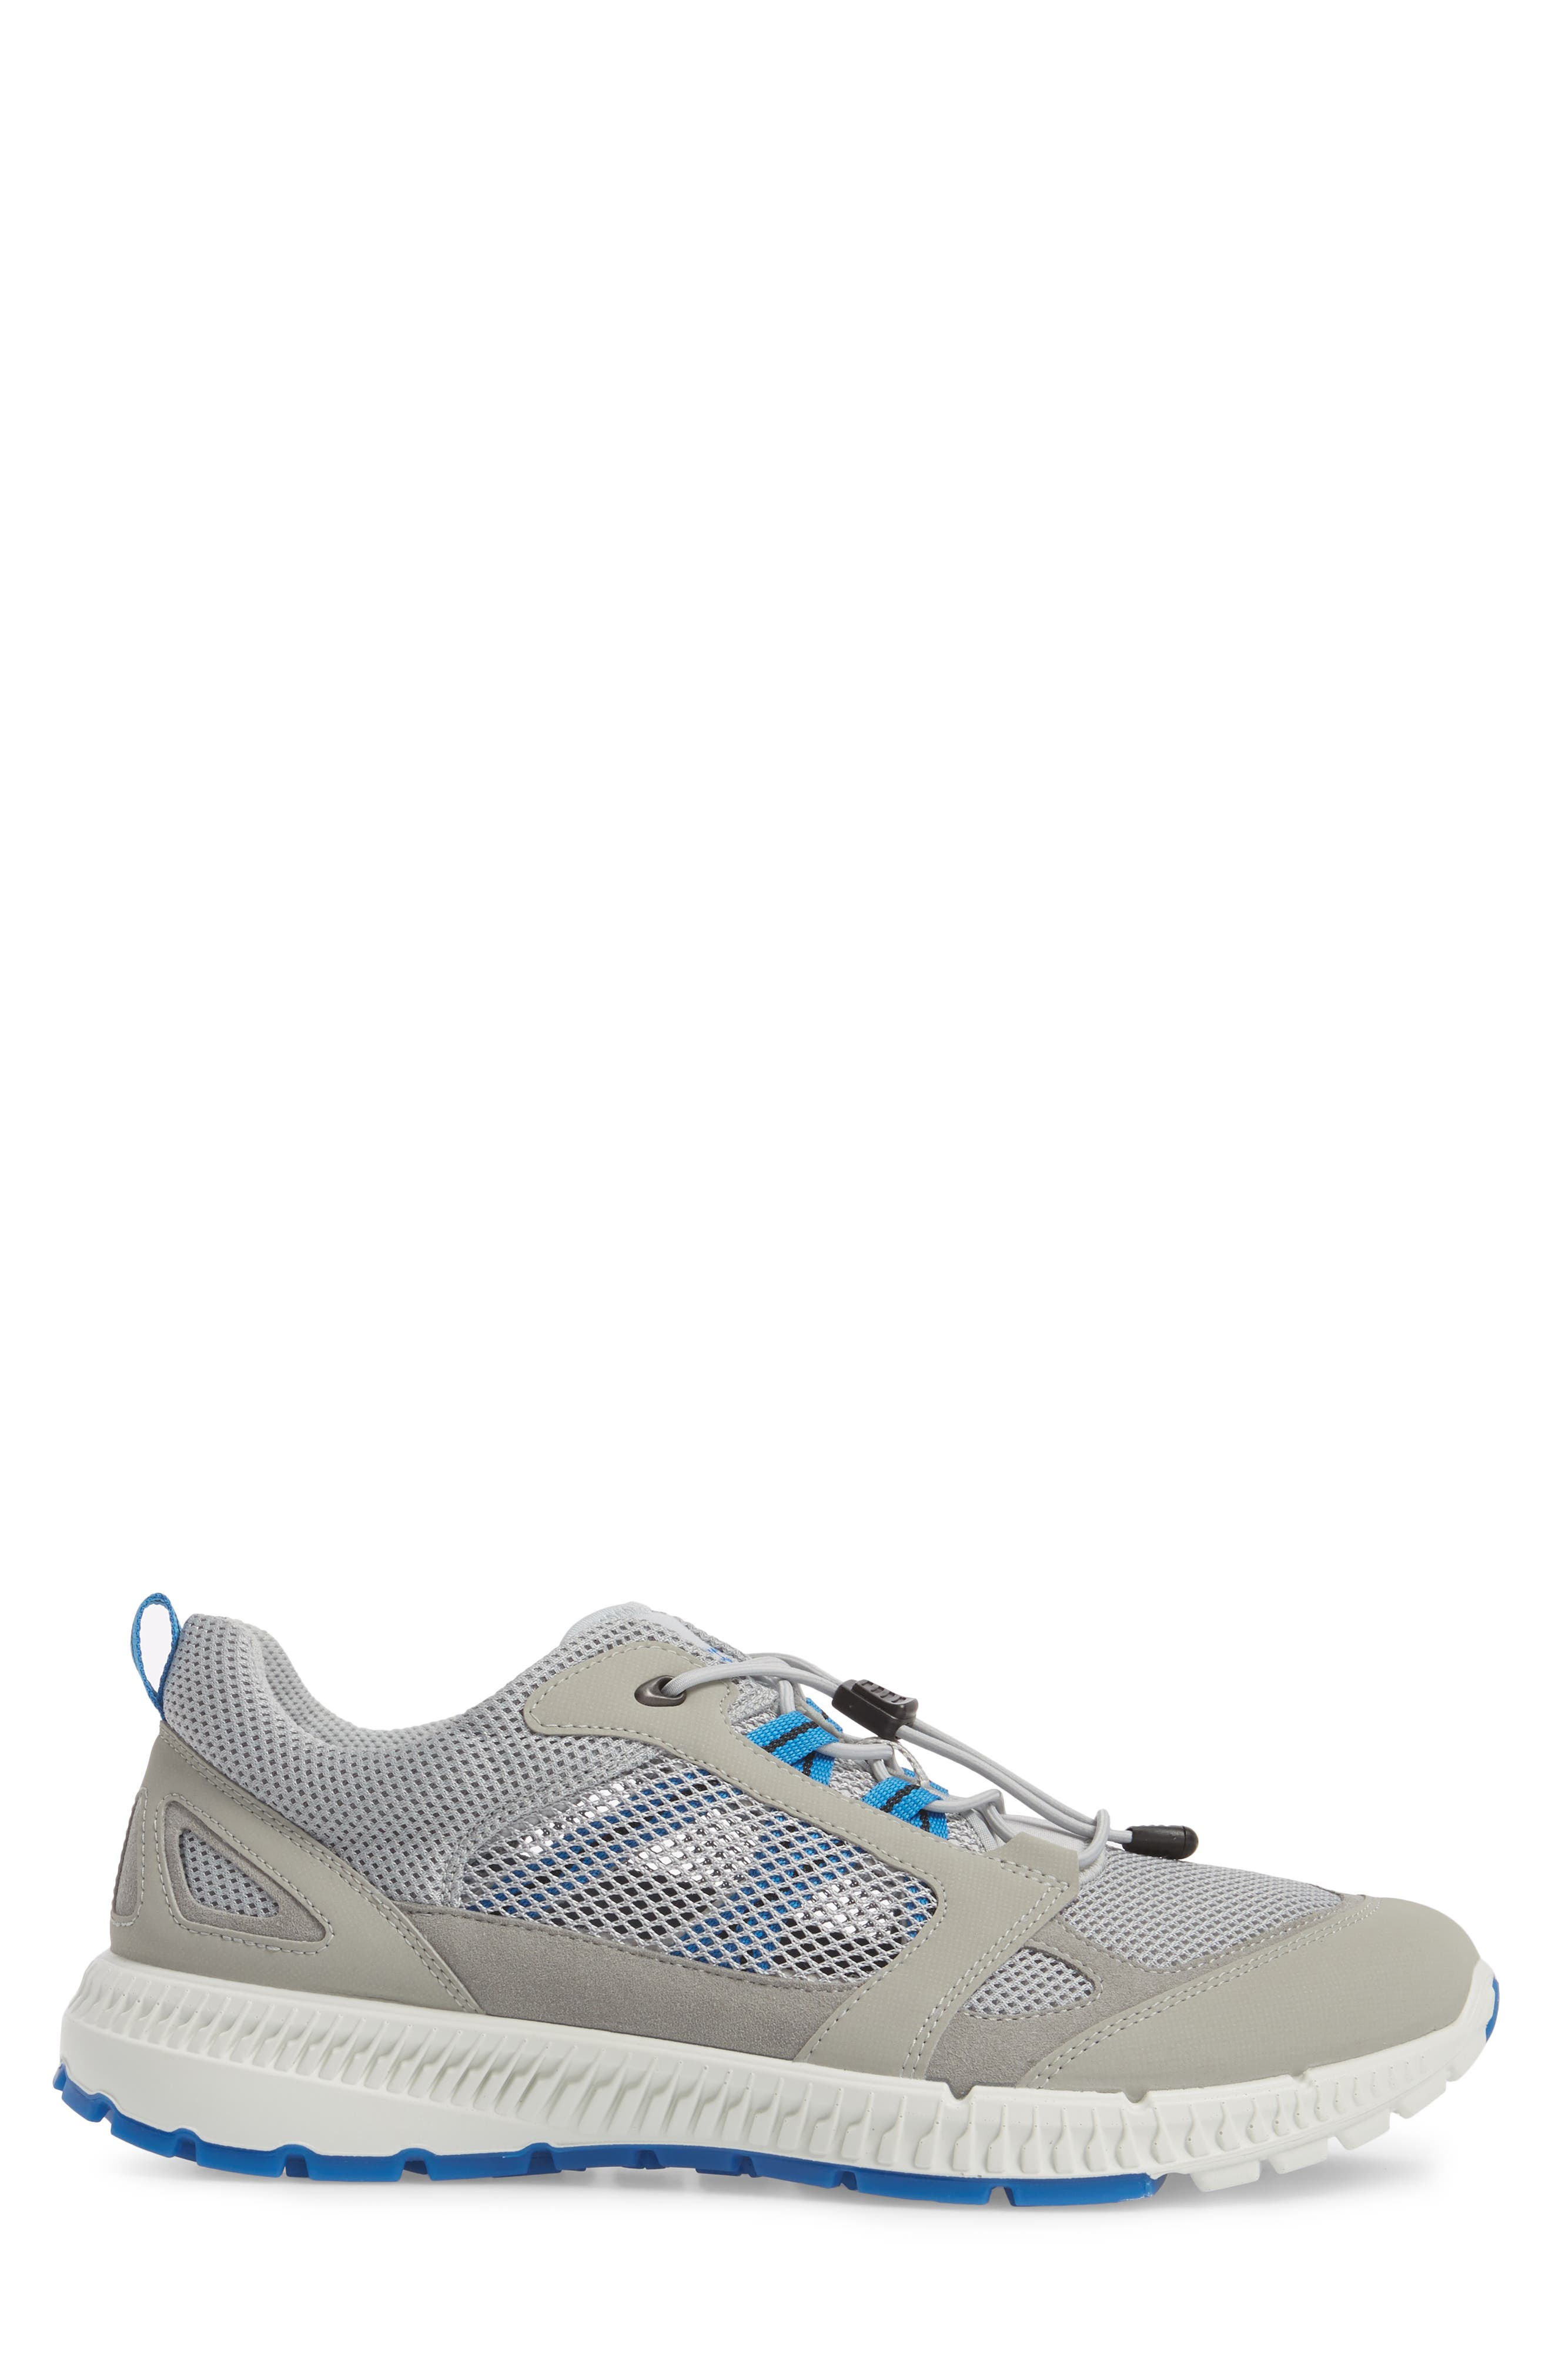 Terracruise II Sneaker,                             Alternate thumbnail 3, color,                             Wild Dove Leather